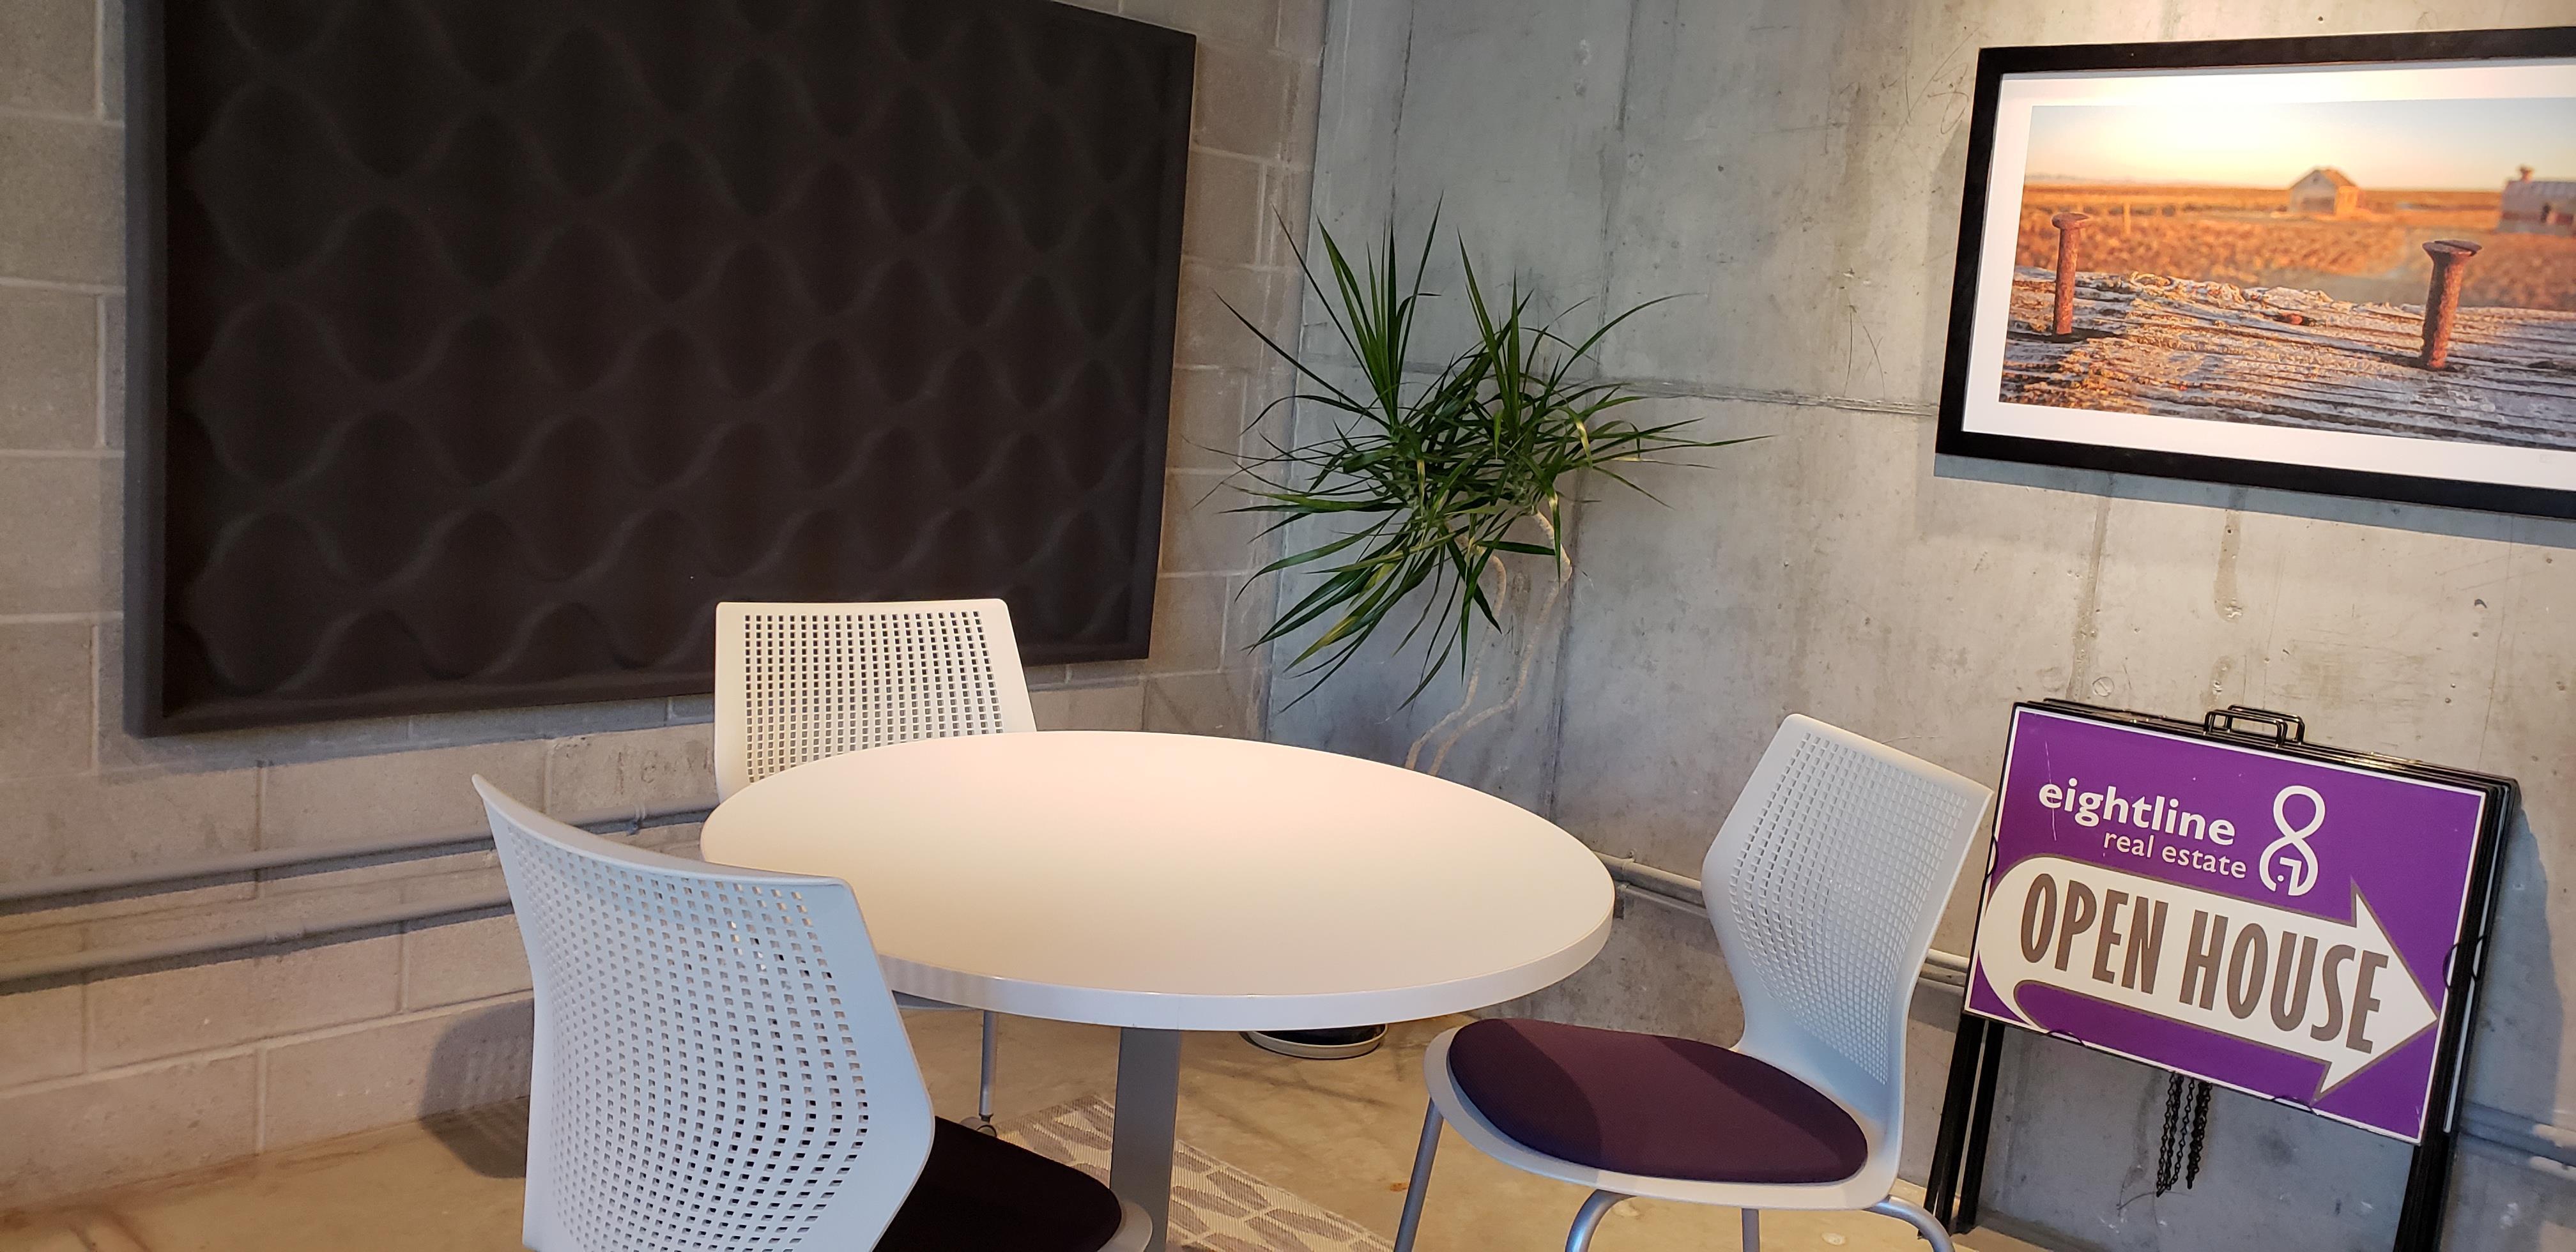 Eightline Real Estate - Semi Private Meeting Area